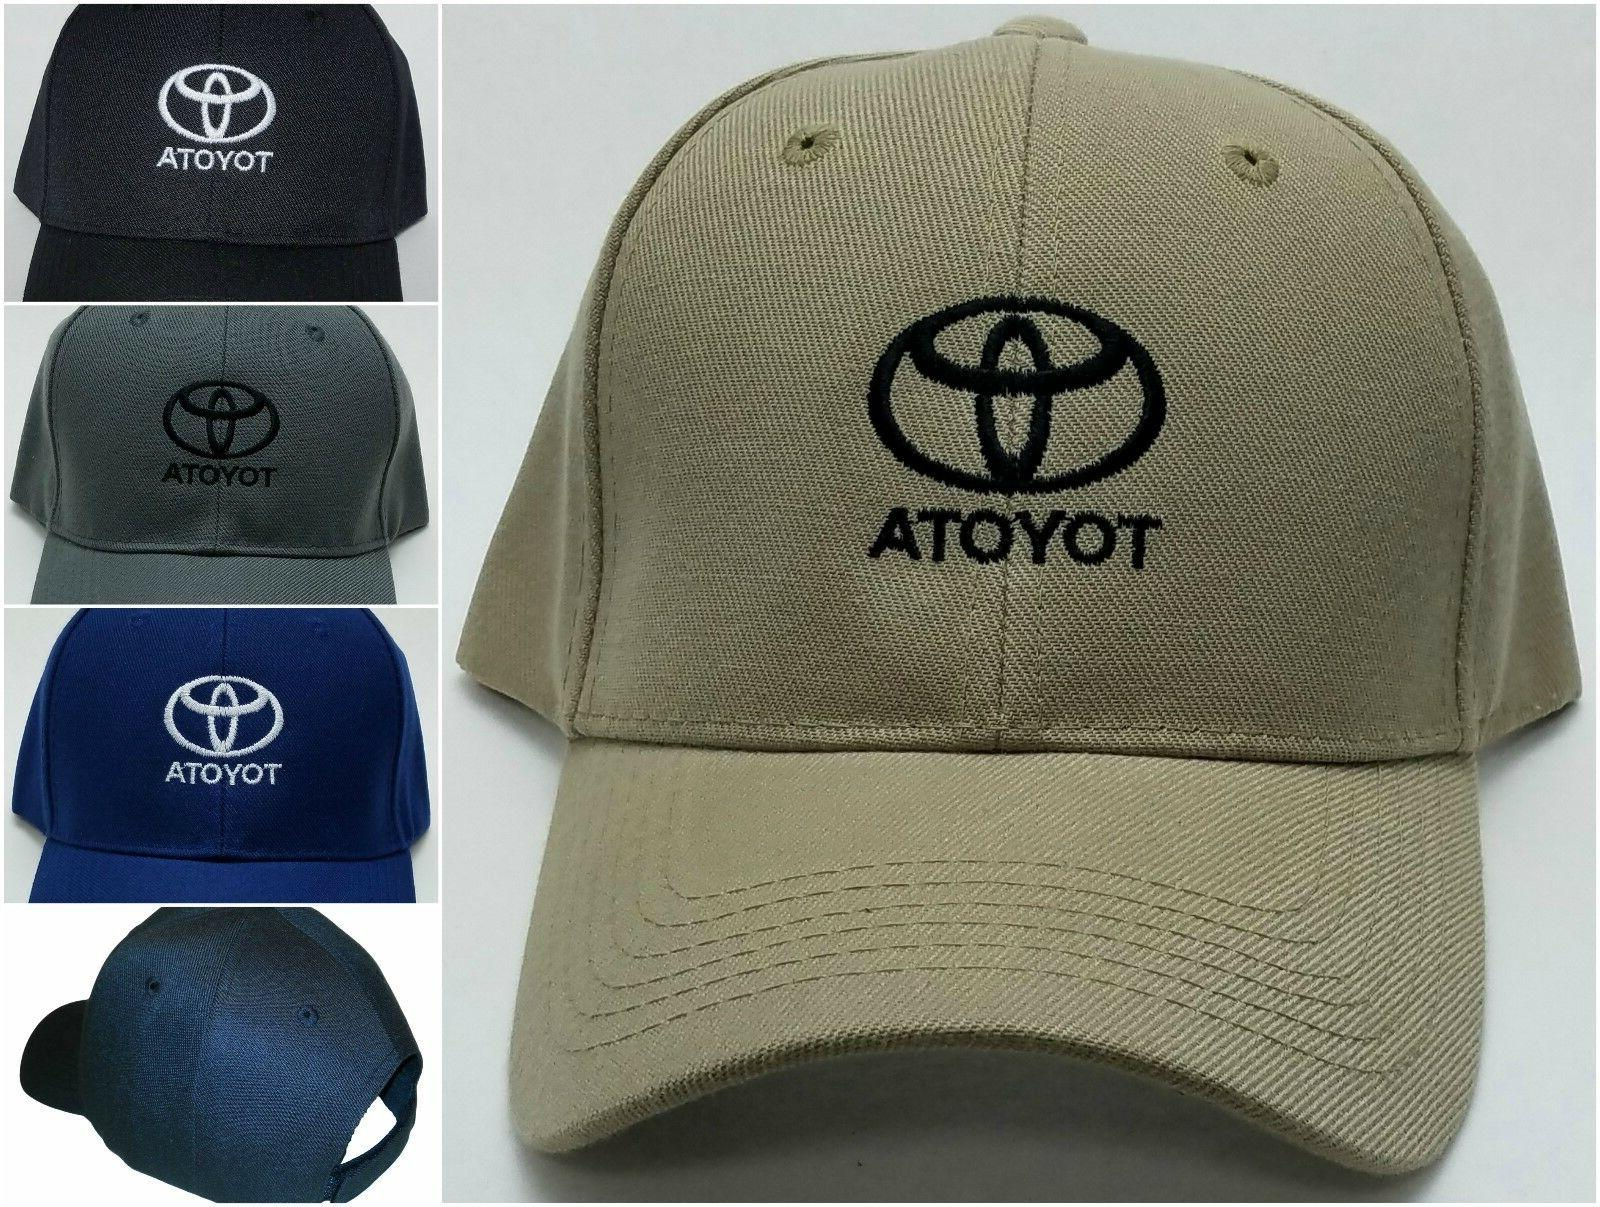 toyota embroidered baseball hat cap adjustable strap